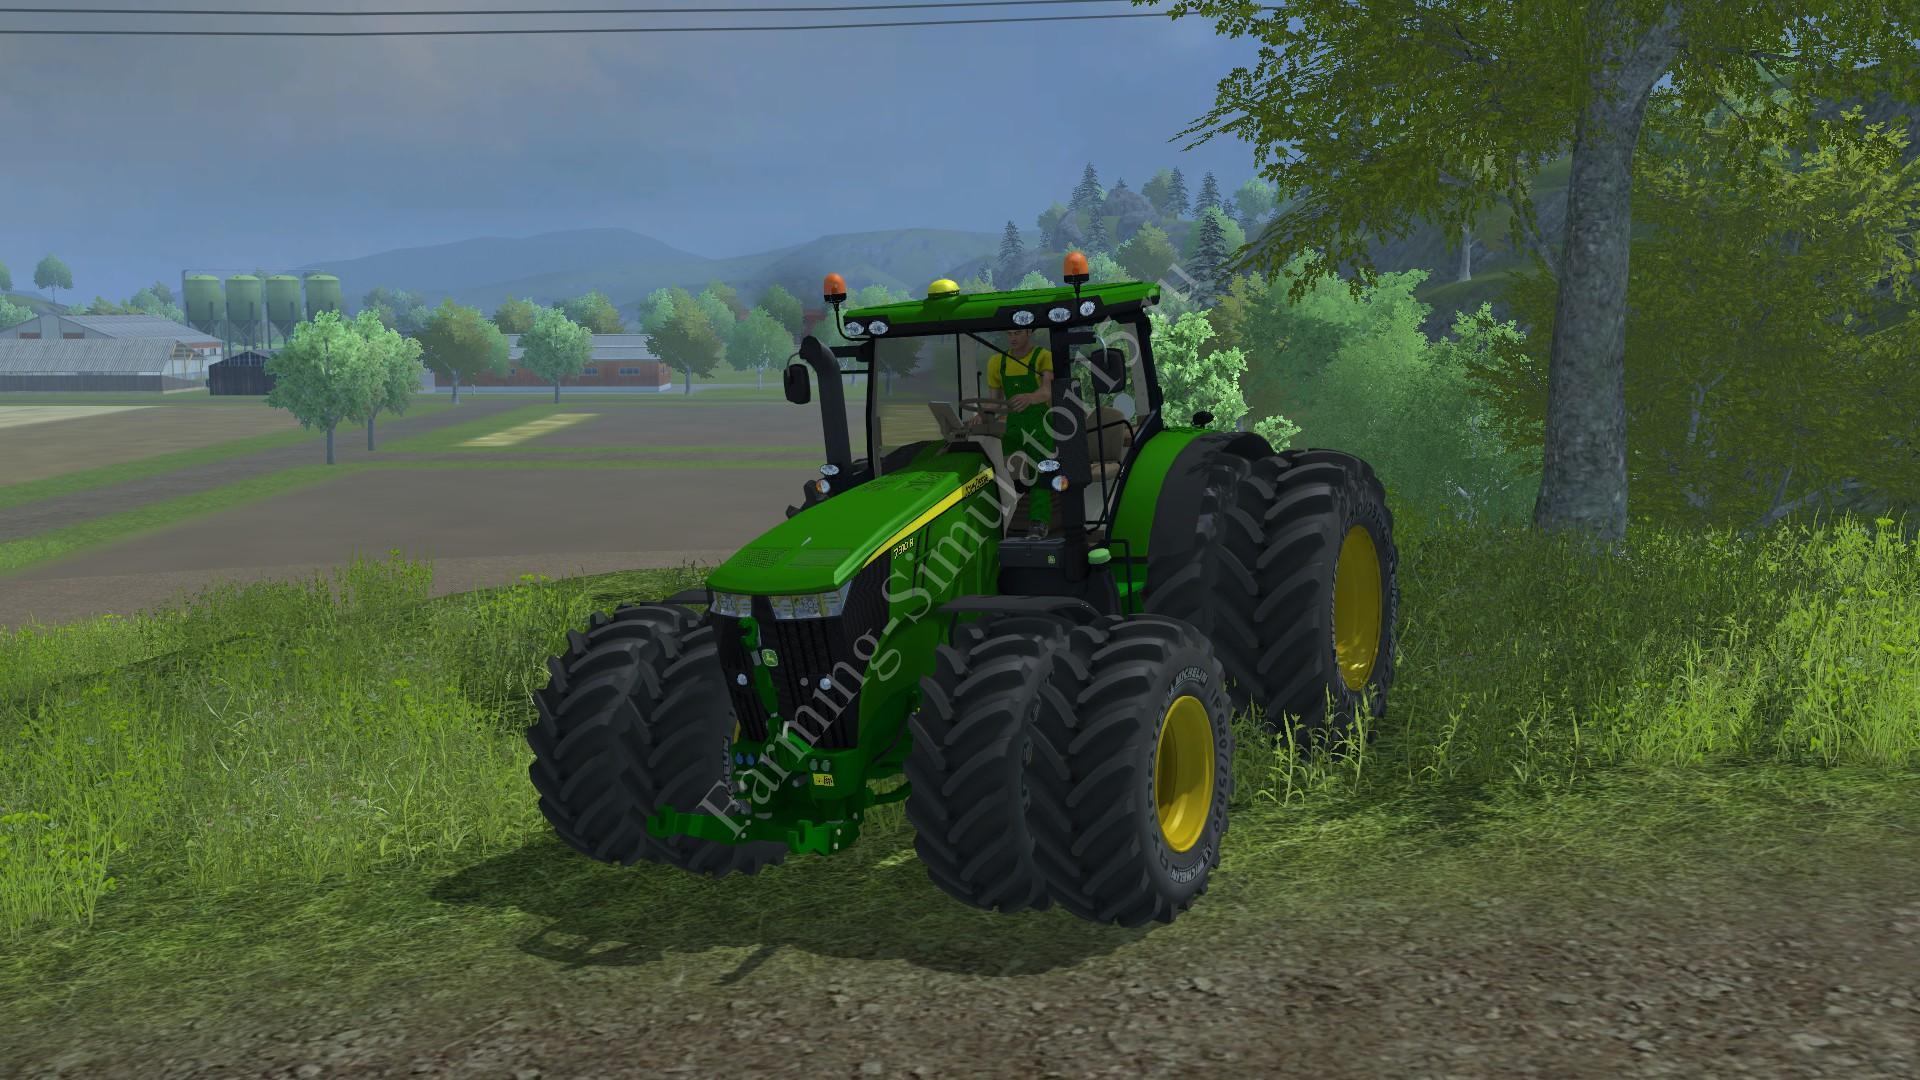 Мод трактора JohnDeere 7310R V2.1 DoubleWheels Farming Simulator 2013, Farming Simulator 13